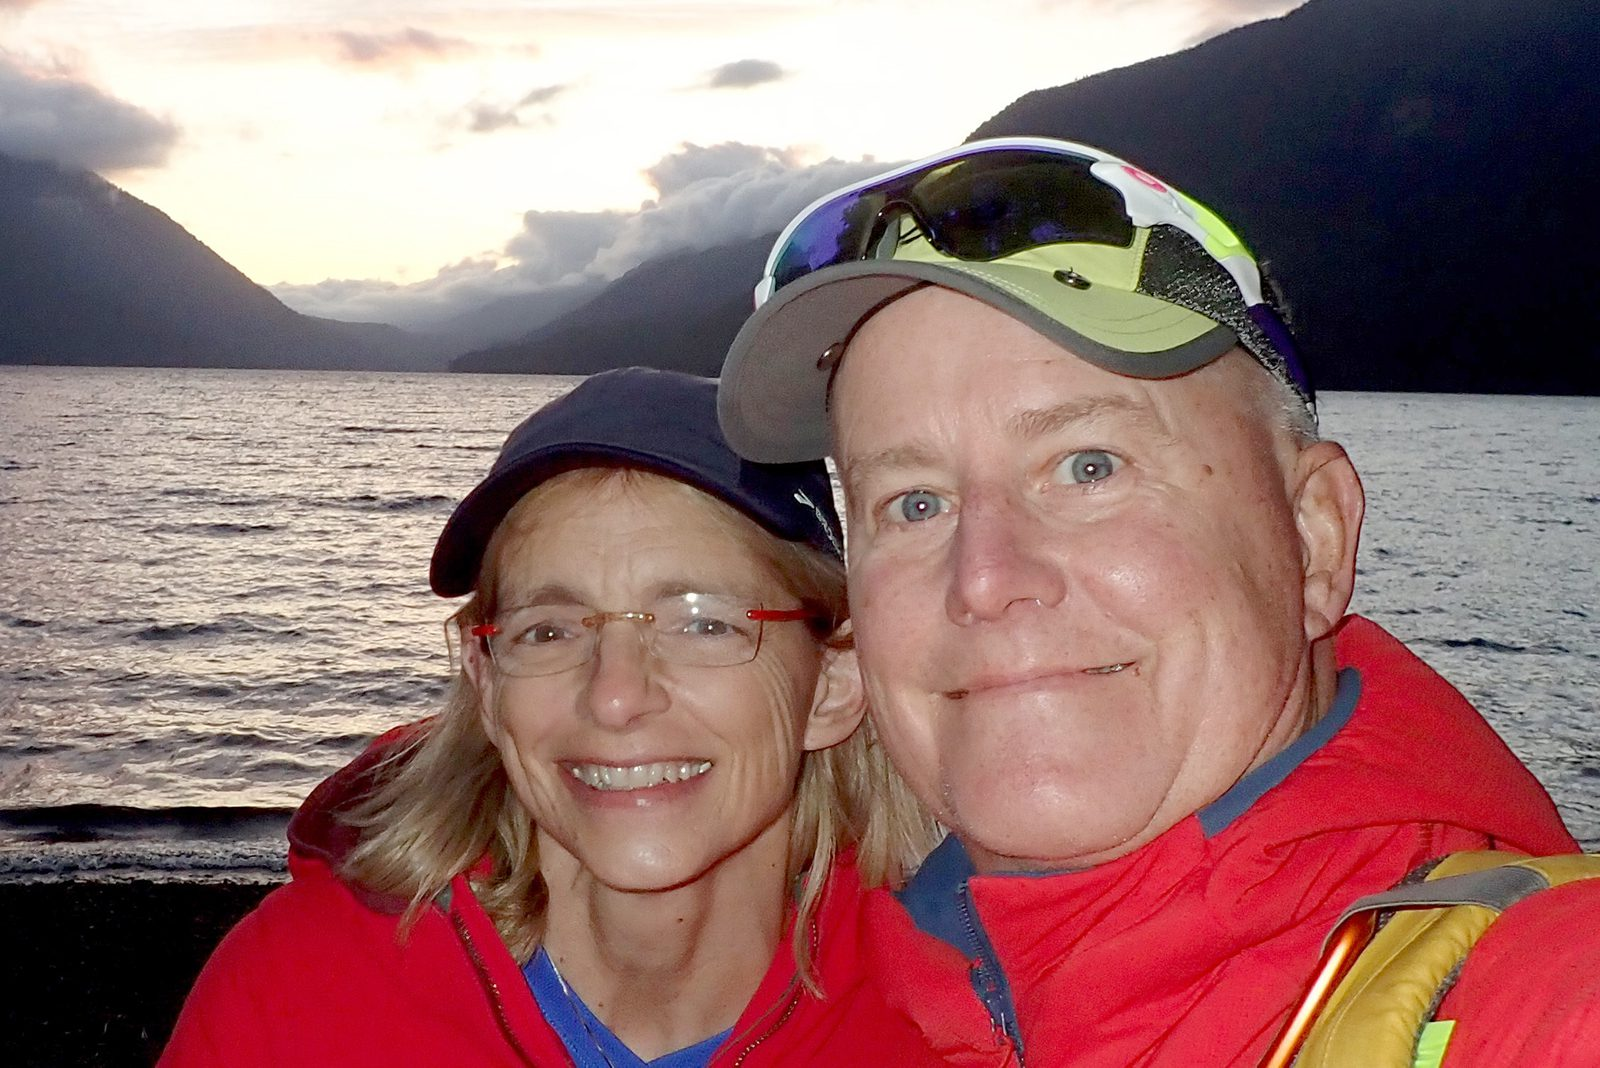 Randy and Lori Cassling P '12